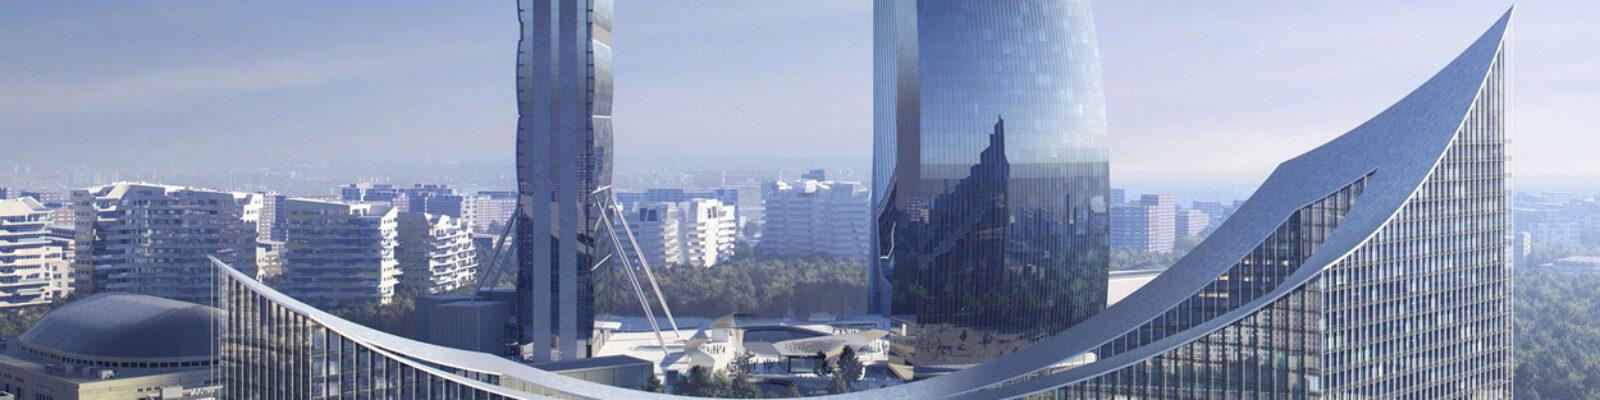 Vista d'insieme del complesso CityLife